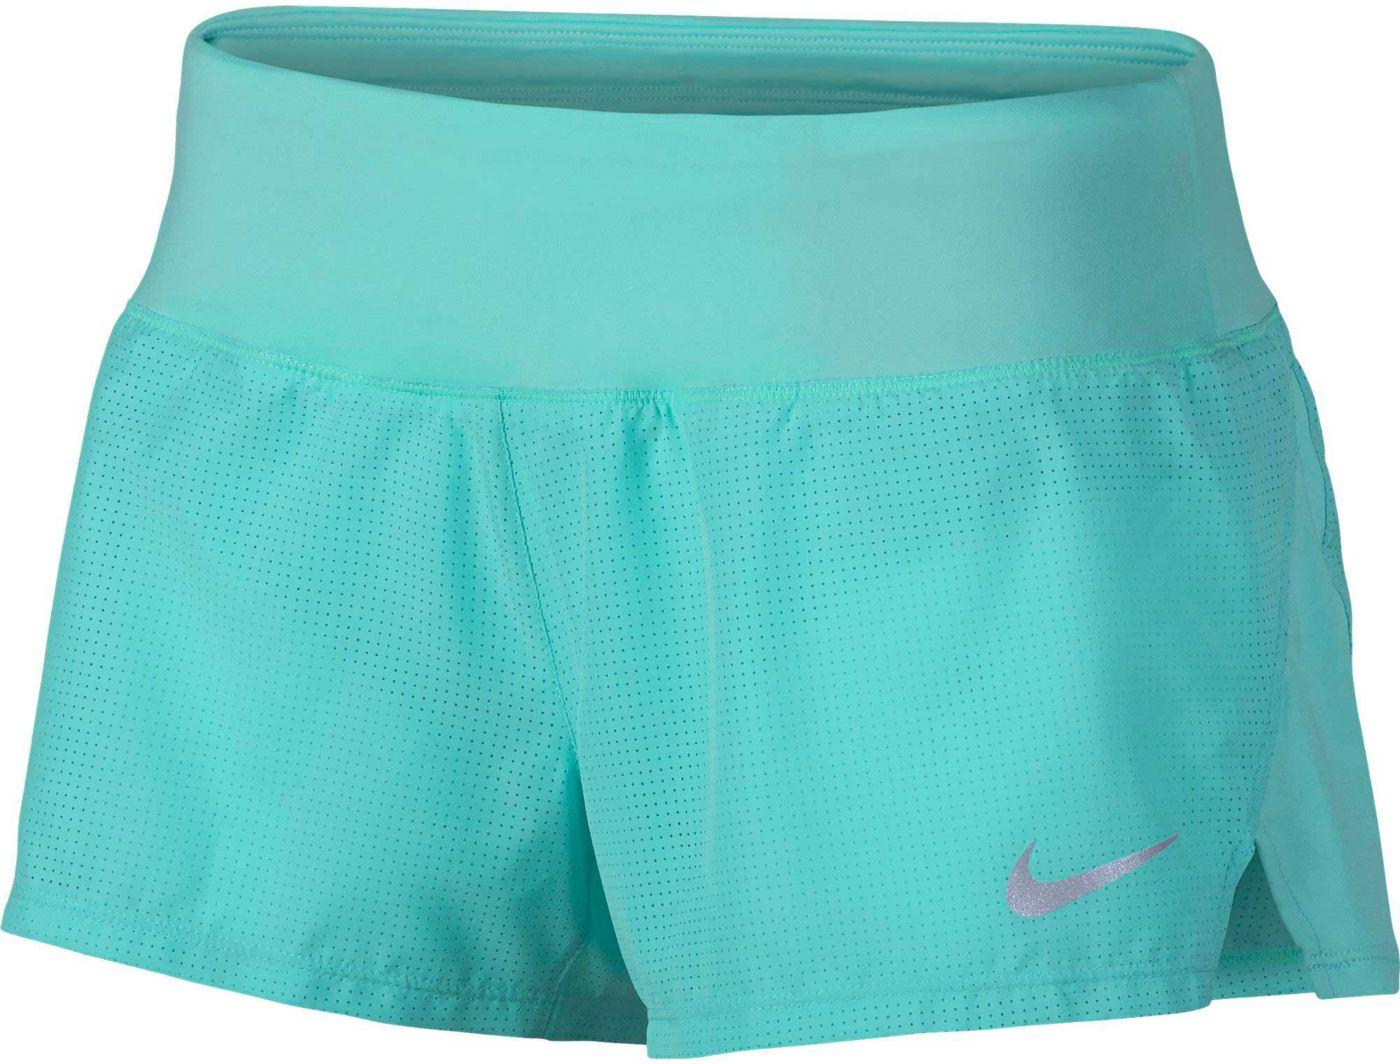 "Nike Women's Dri-FIT Cool Crew 3"" Running Shorts"